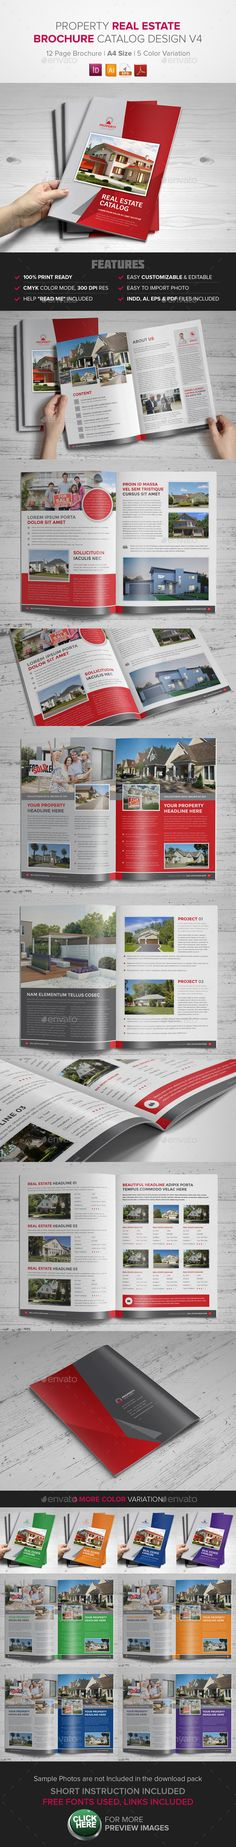 Real Estate Property Brochure Catalog